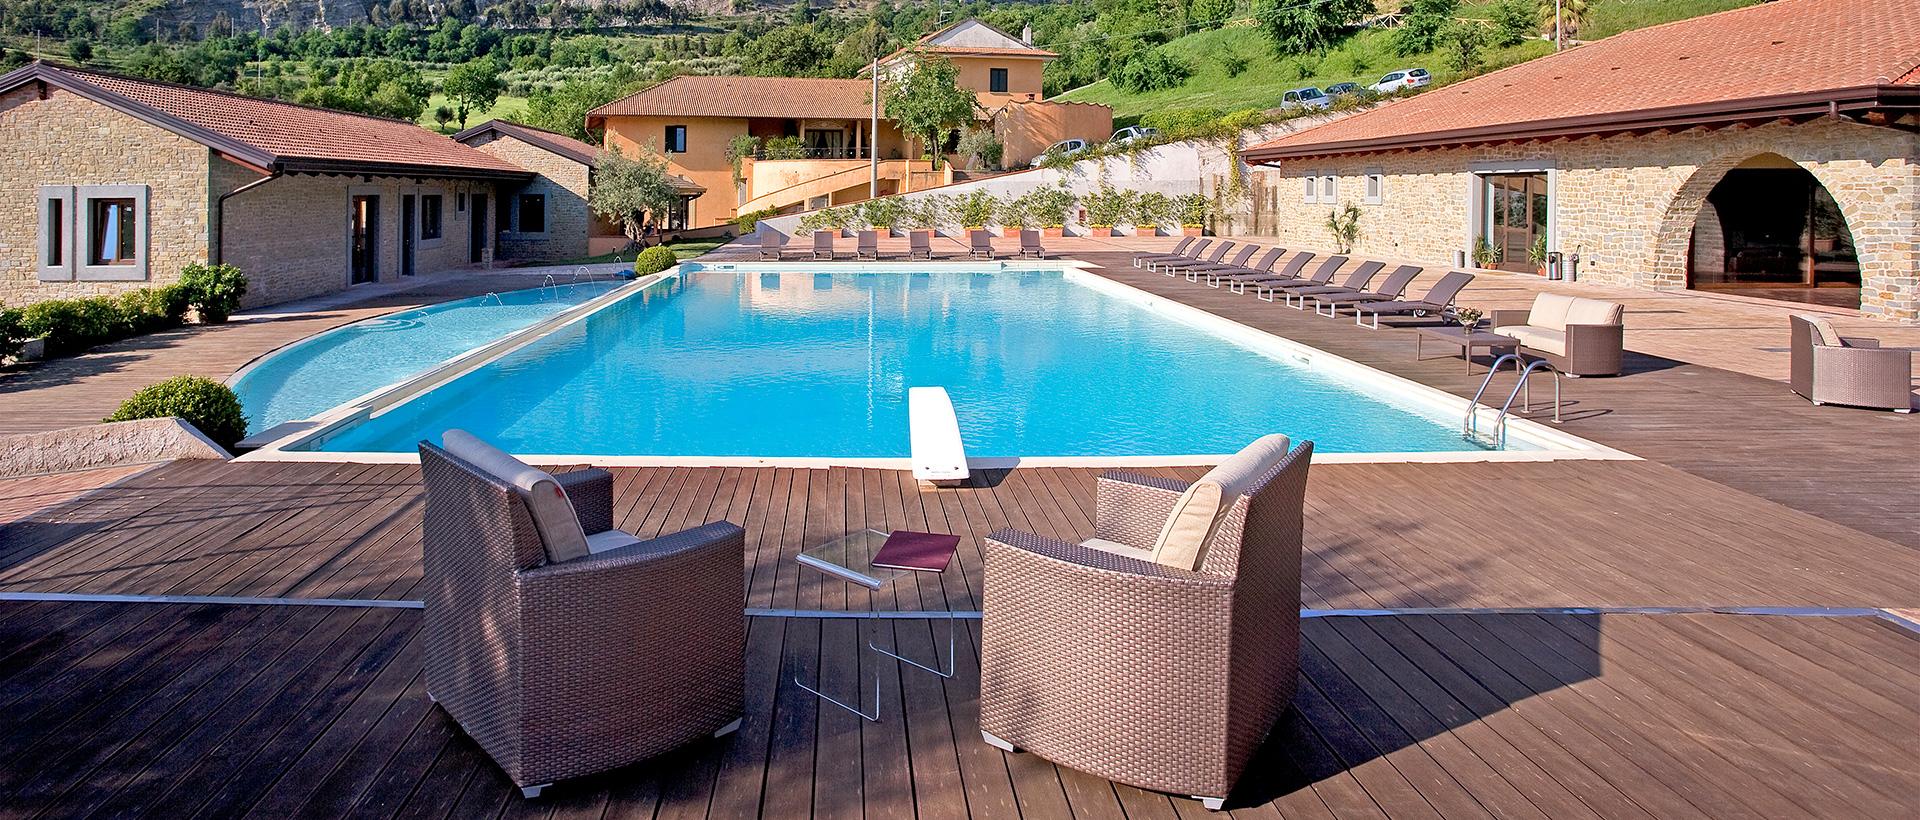 Piscine All Aperto Piemonte piscina | tenuta d'amore